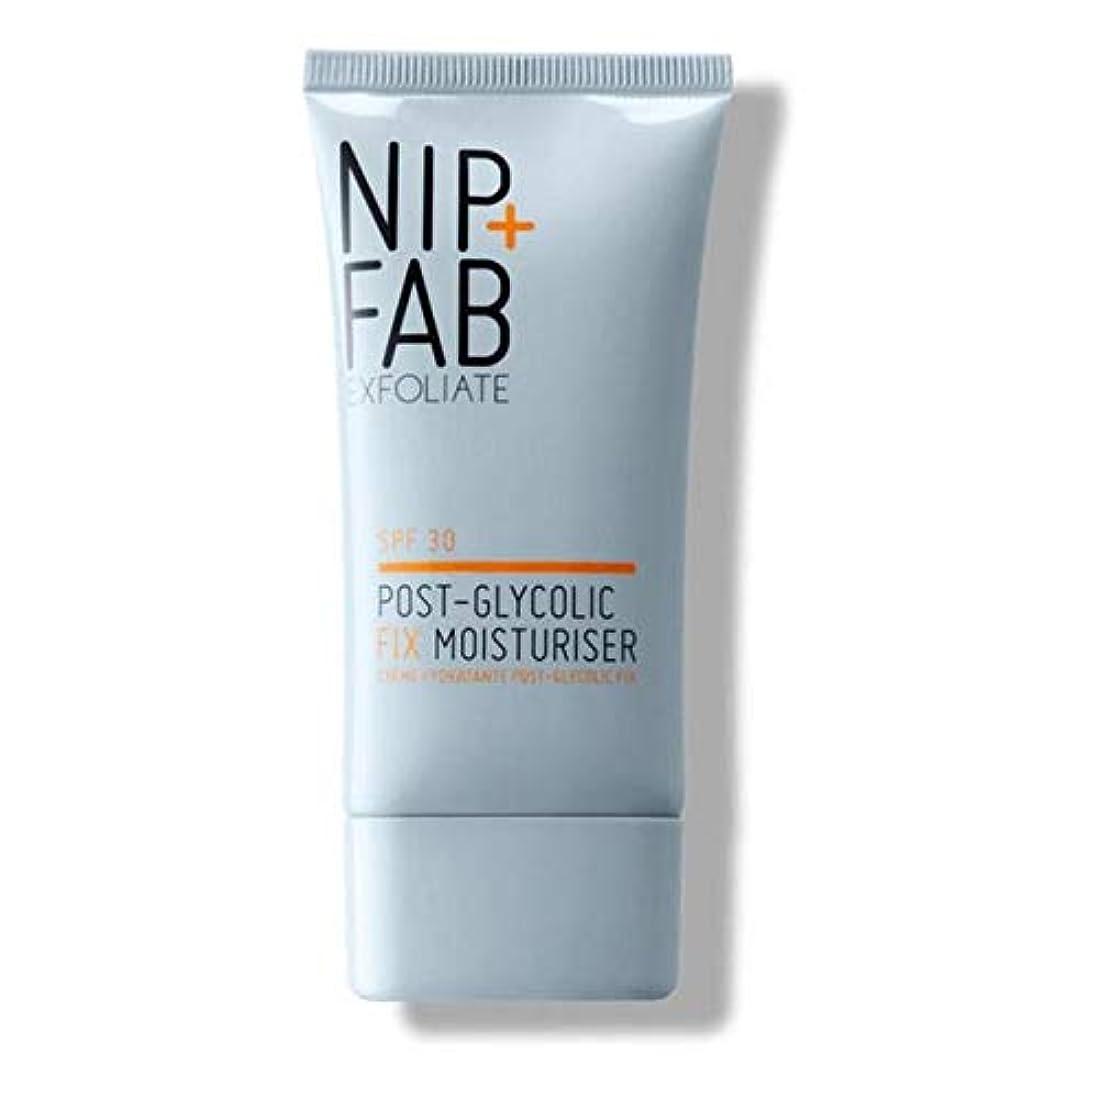 [Nip & Fab ] + Fabポストグリコール修正モイスチャライザーSpf 30 40ミリリットルニップ - Nip+Fab Post Glycolic Fix Moisturiser SPF 30 40ml [並行輸入品]